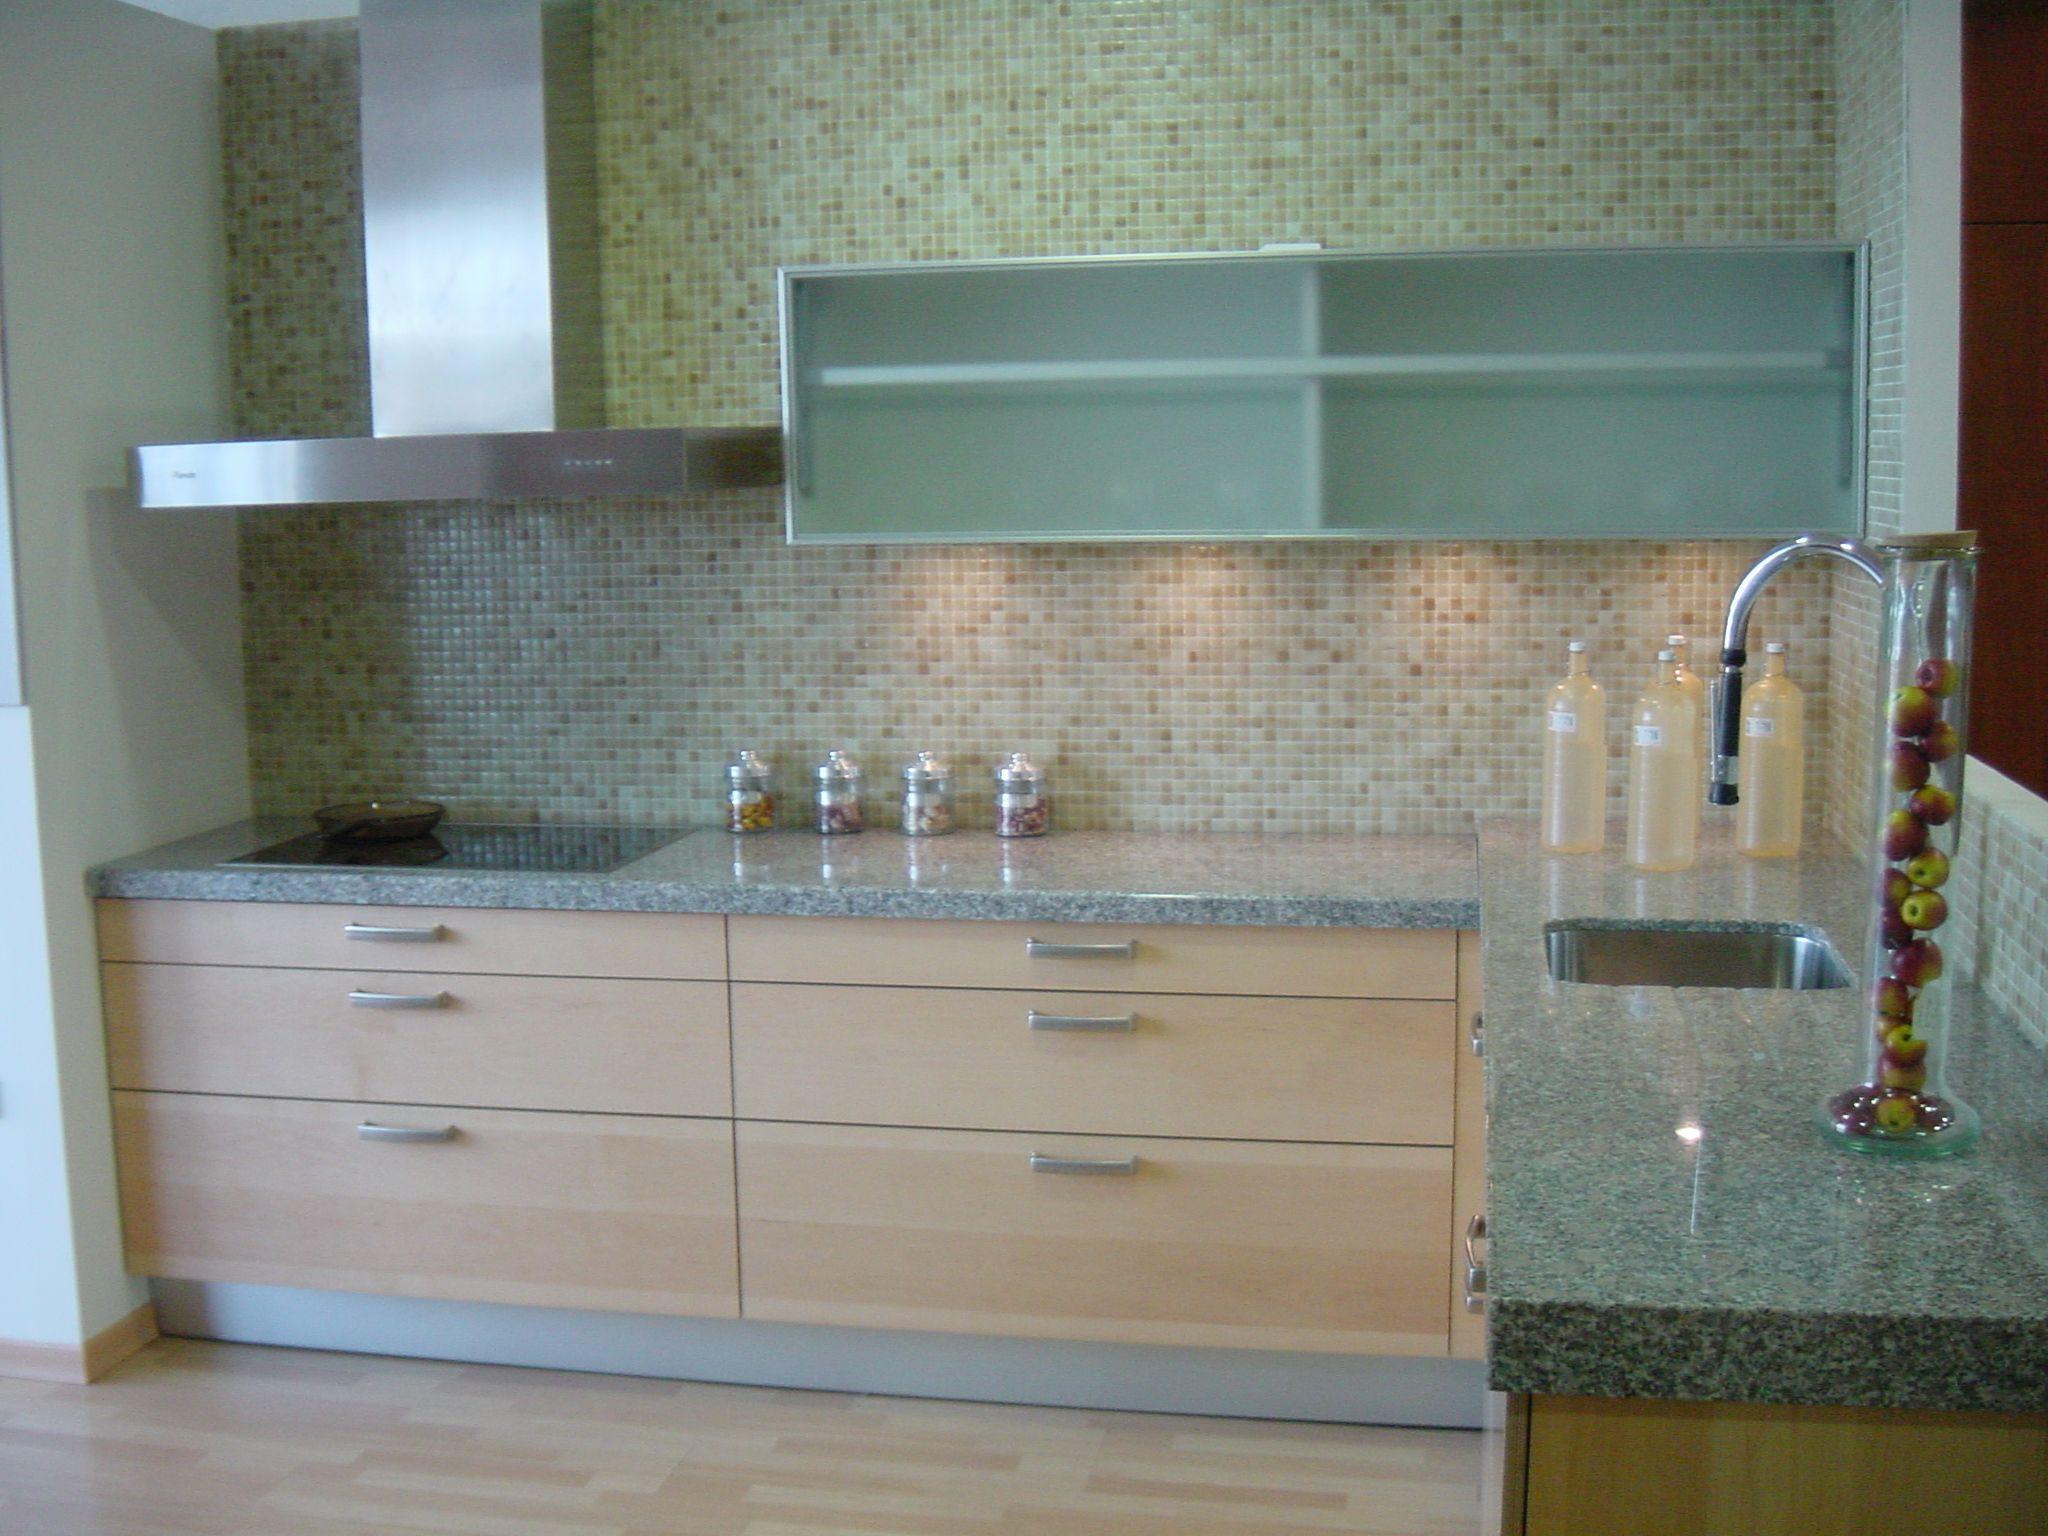 Cocina modelo marina home sweet home pinterest - Sweet home muebles ...